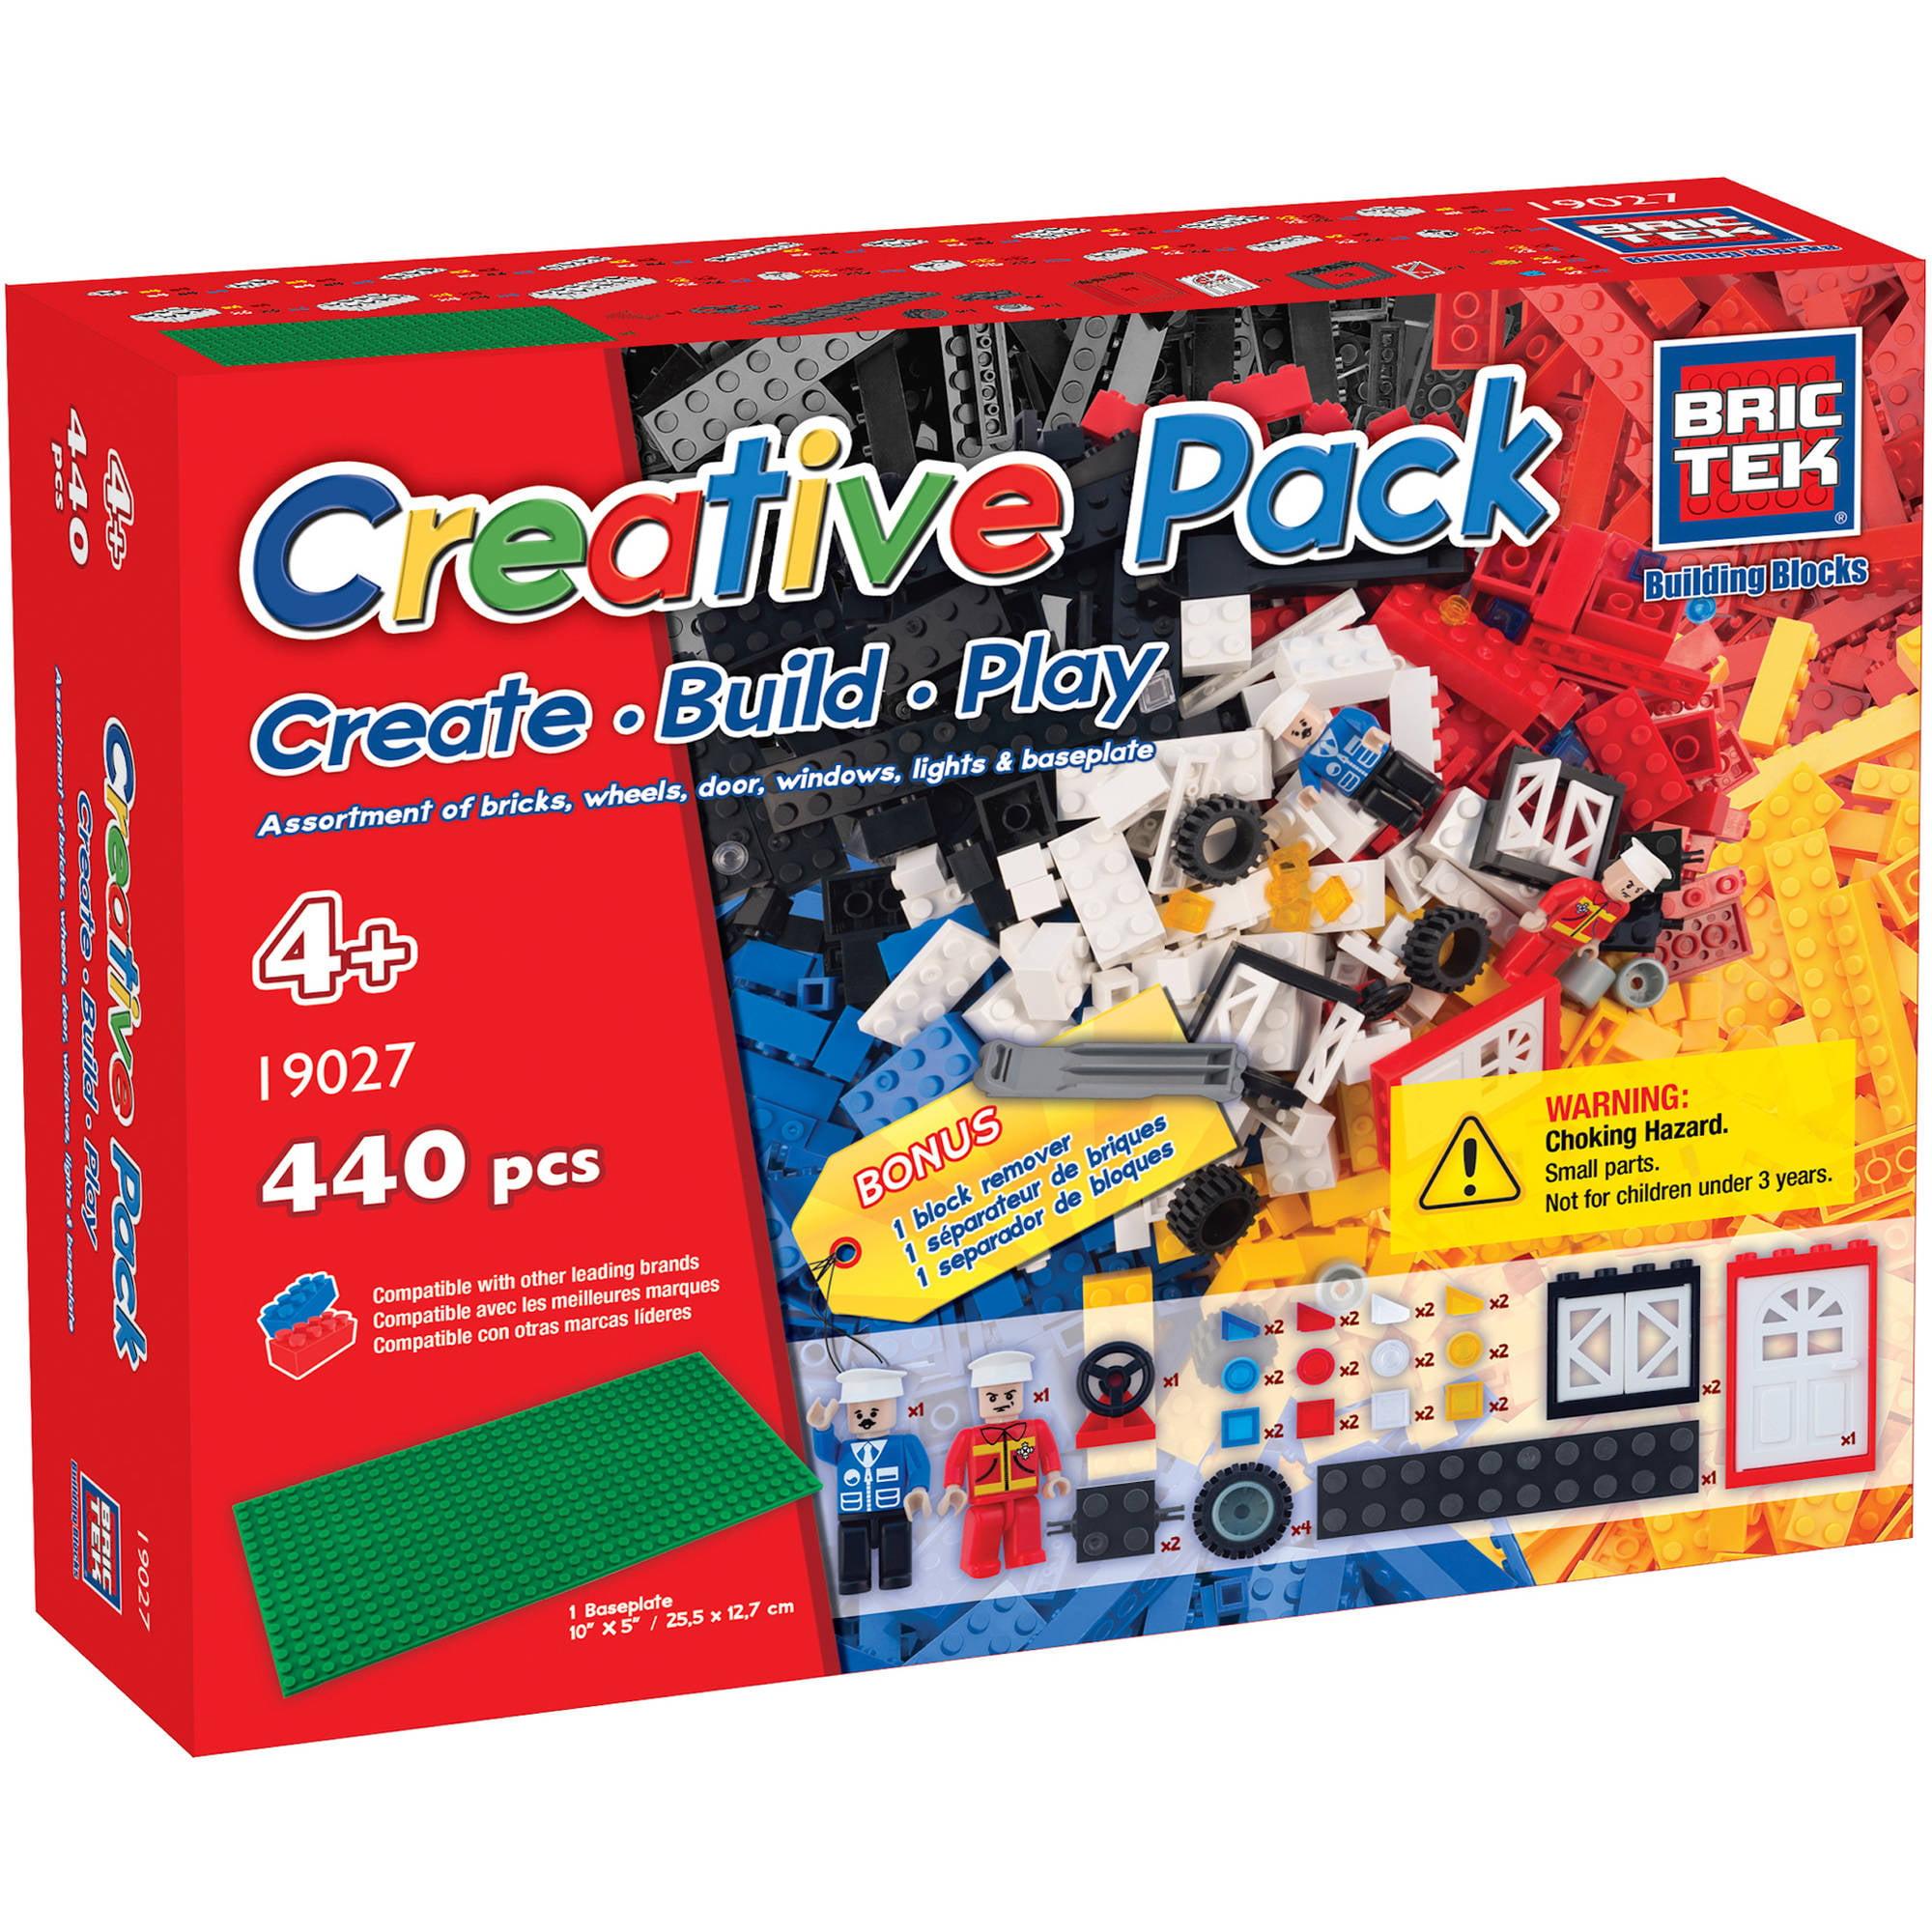 BricTek 440-Piece Creative Pack